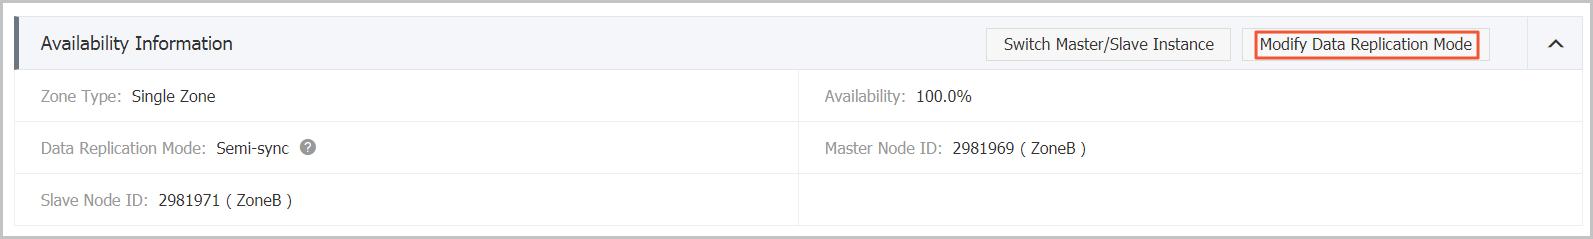 Modify data replication mode